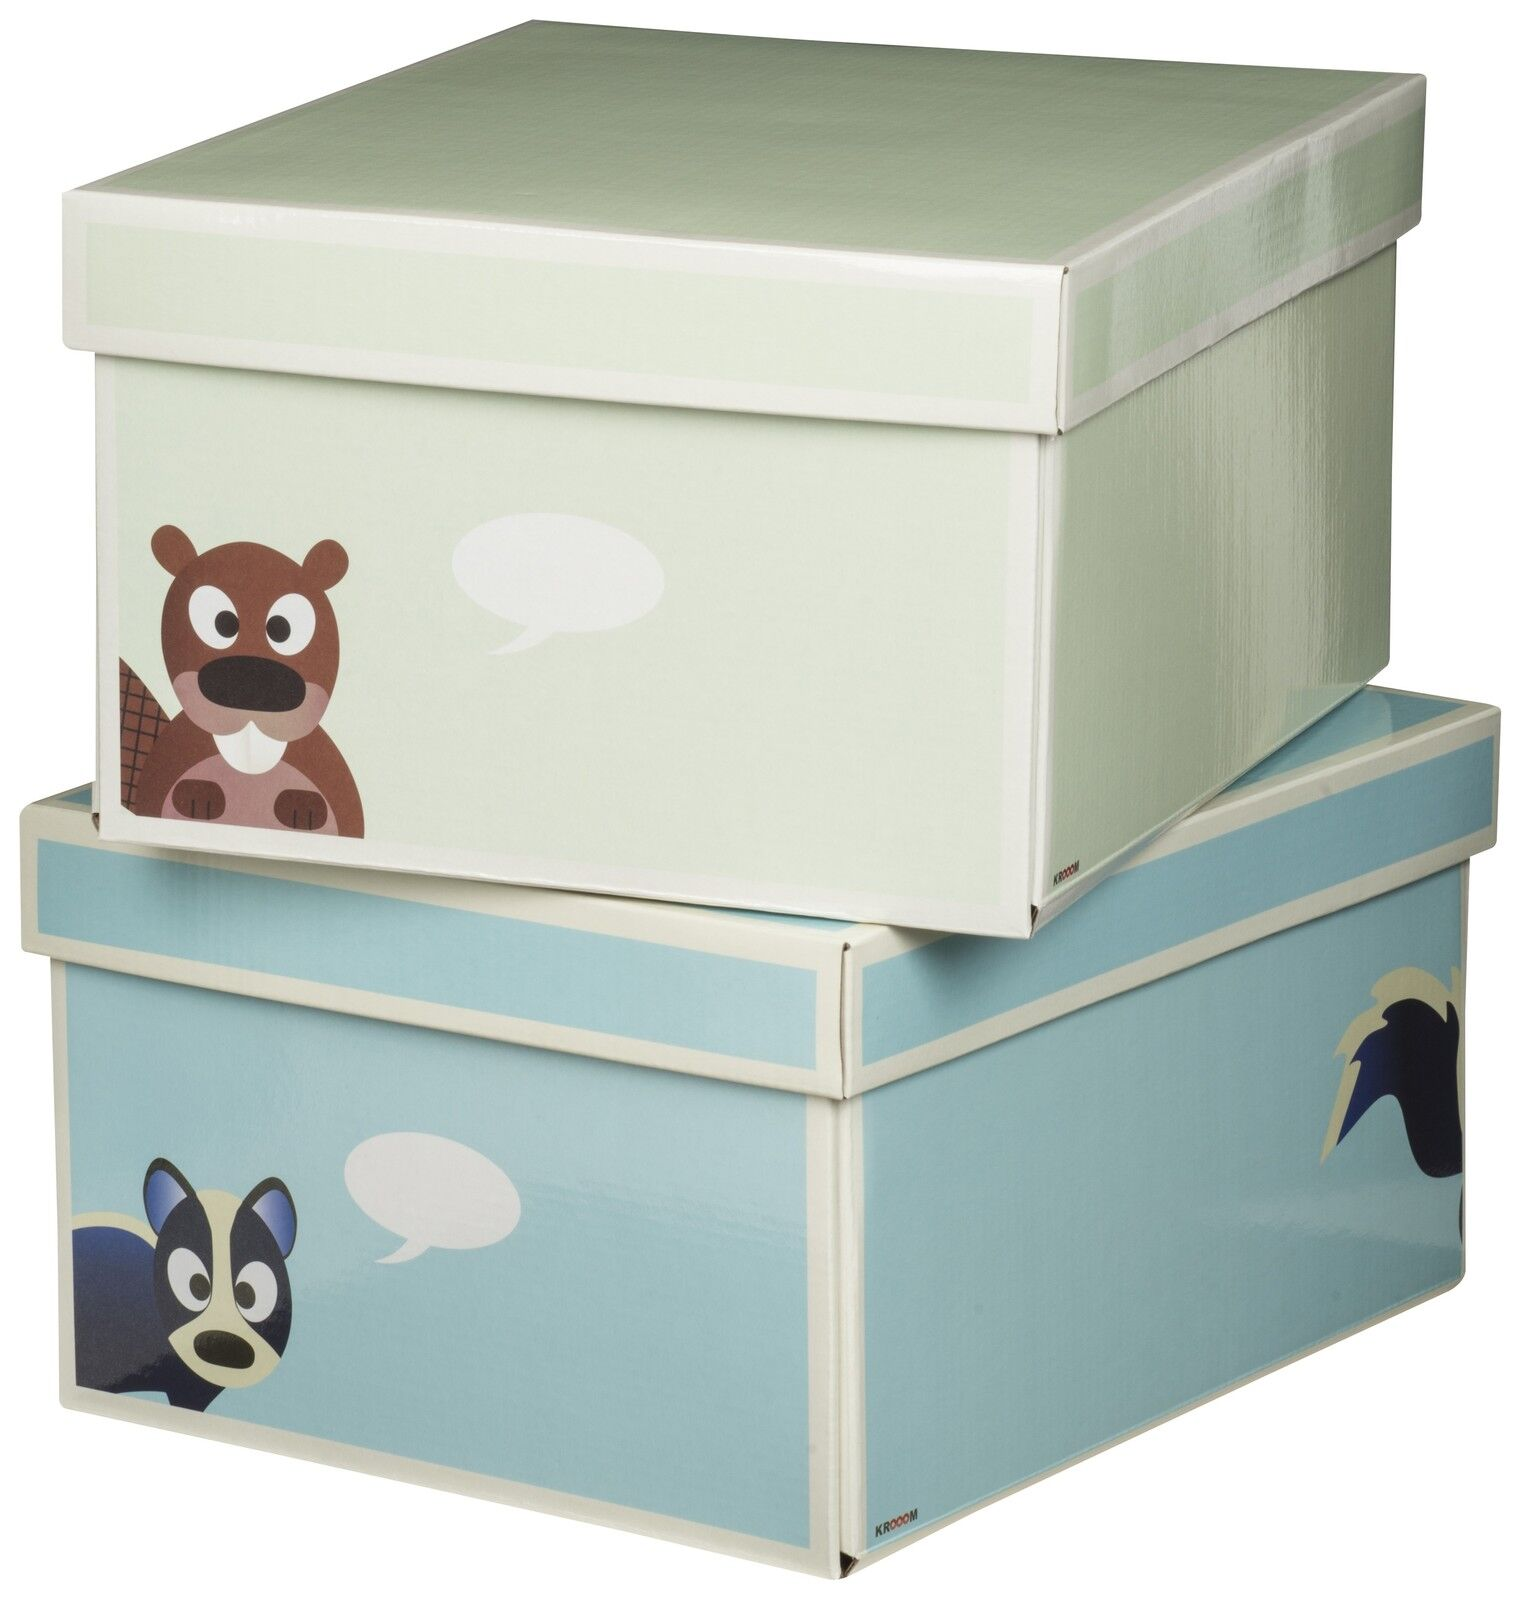 Set Of 2 Krooom Eco Friendly 35cm Storage Box Cardboard Strong Toys Tidy Bedroom 5038673944944 Ebay